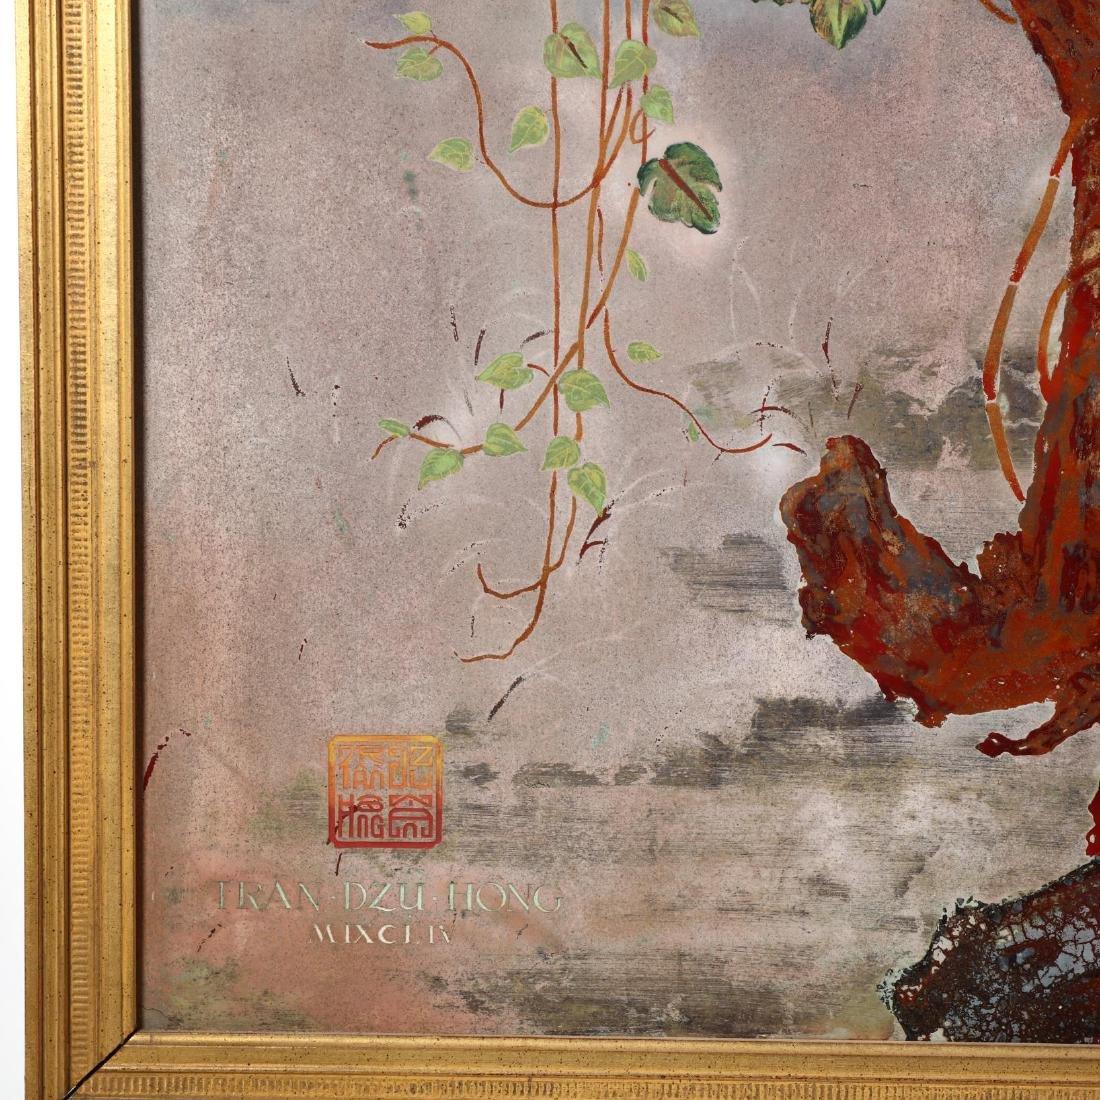 Tran Dzu Hong (Vietnamese, 1922-2002), A Painting of - 2